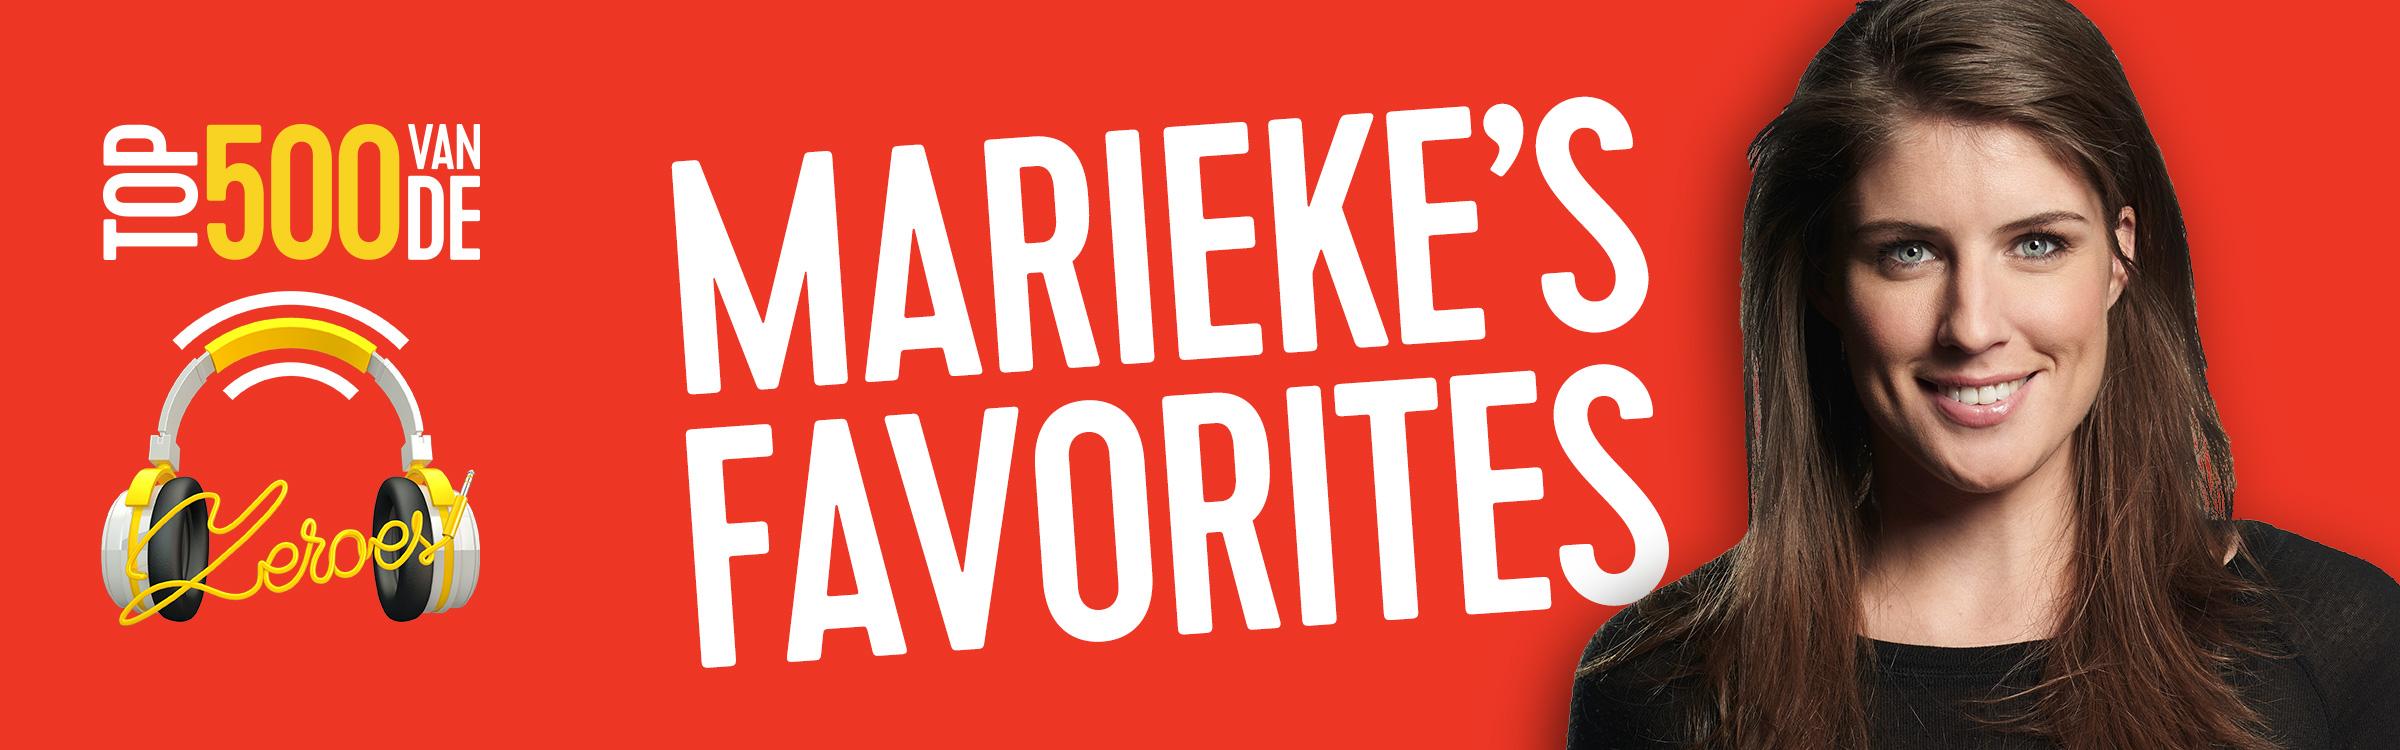 Marieke favo header